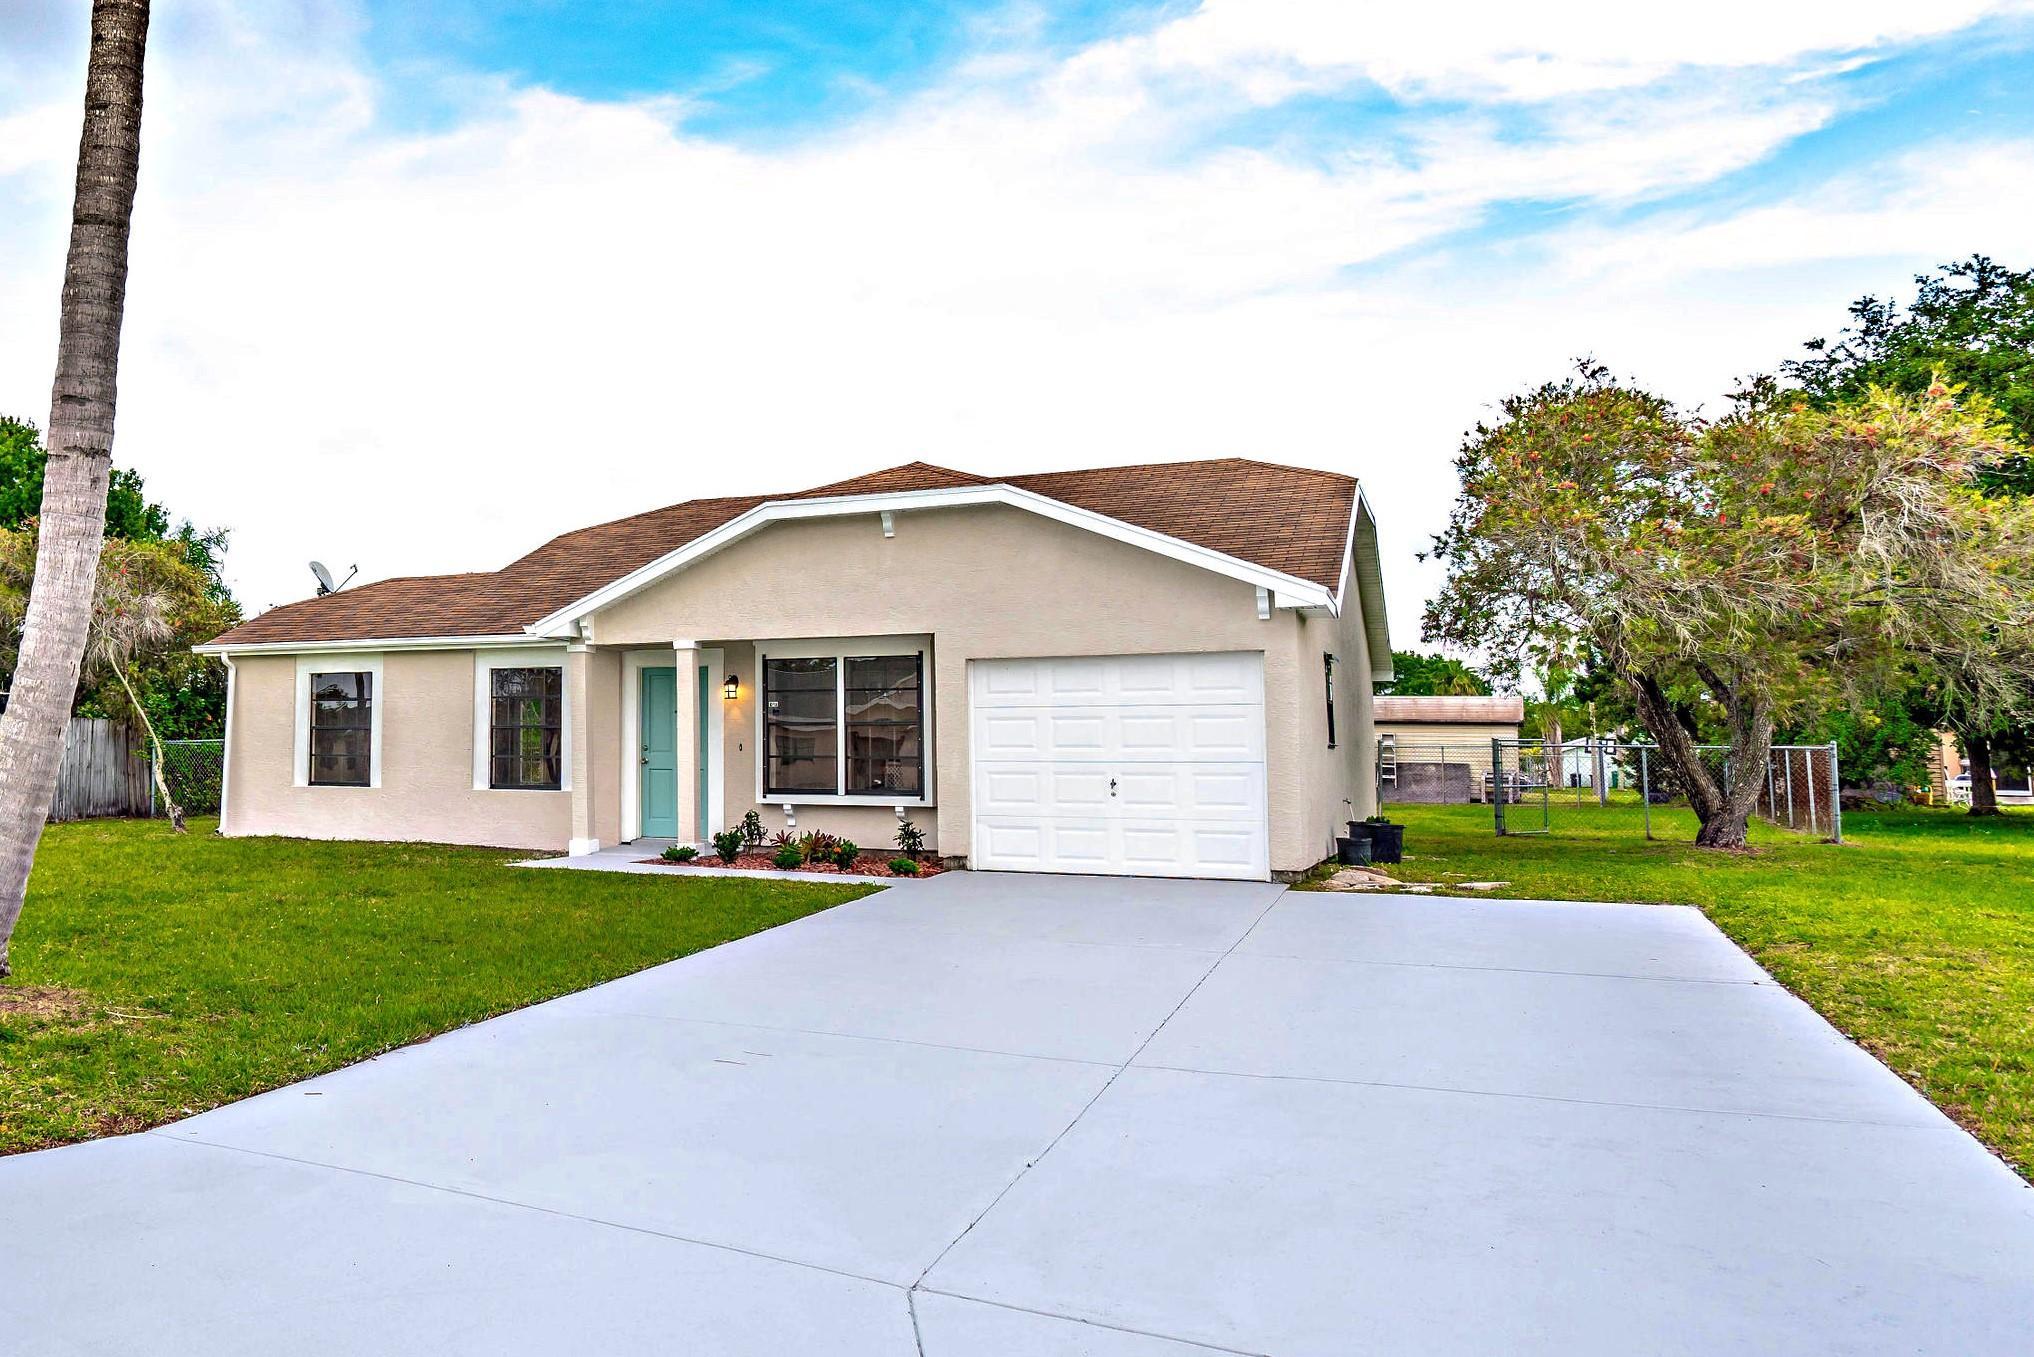 2326 SE Rainier Road 34952 - One of Port Saint Lucie Homes for Sale